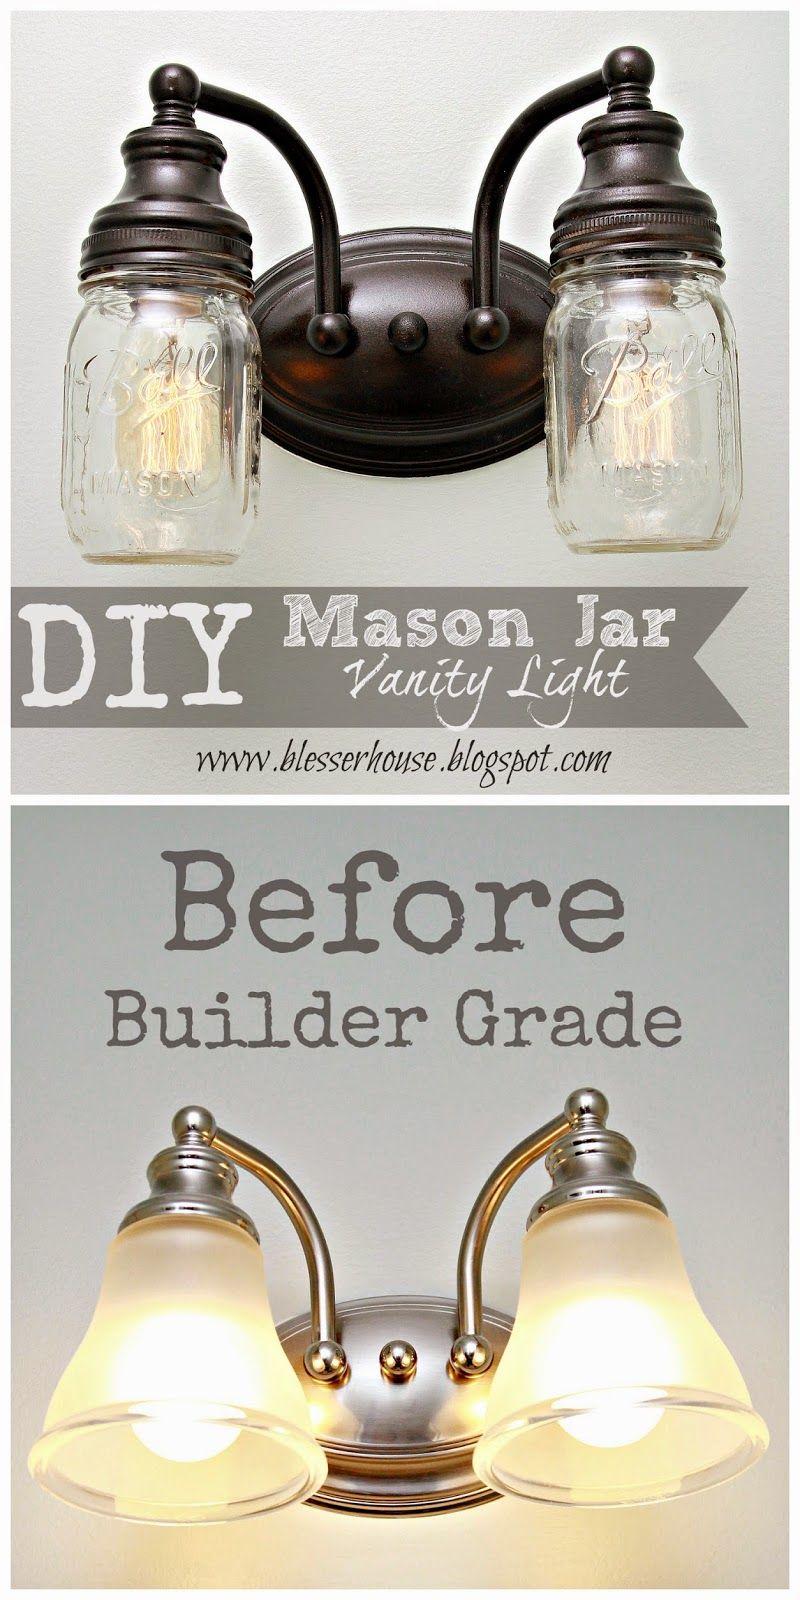 Diy Mason Jar Vanity Light Mason Jar Diy Mason Jars Mason Jar